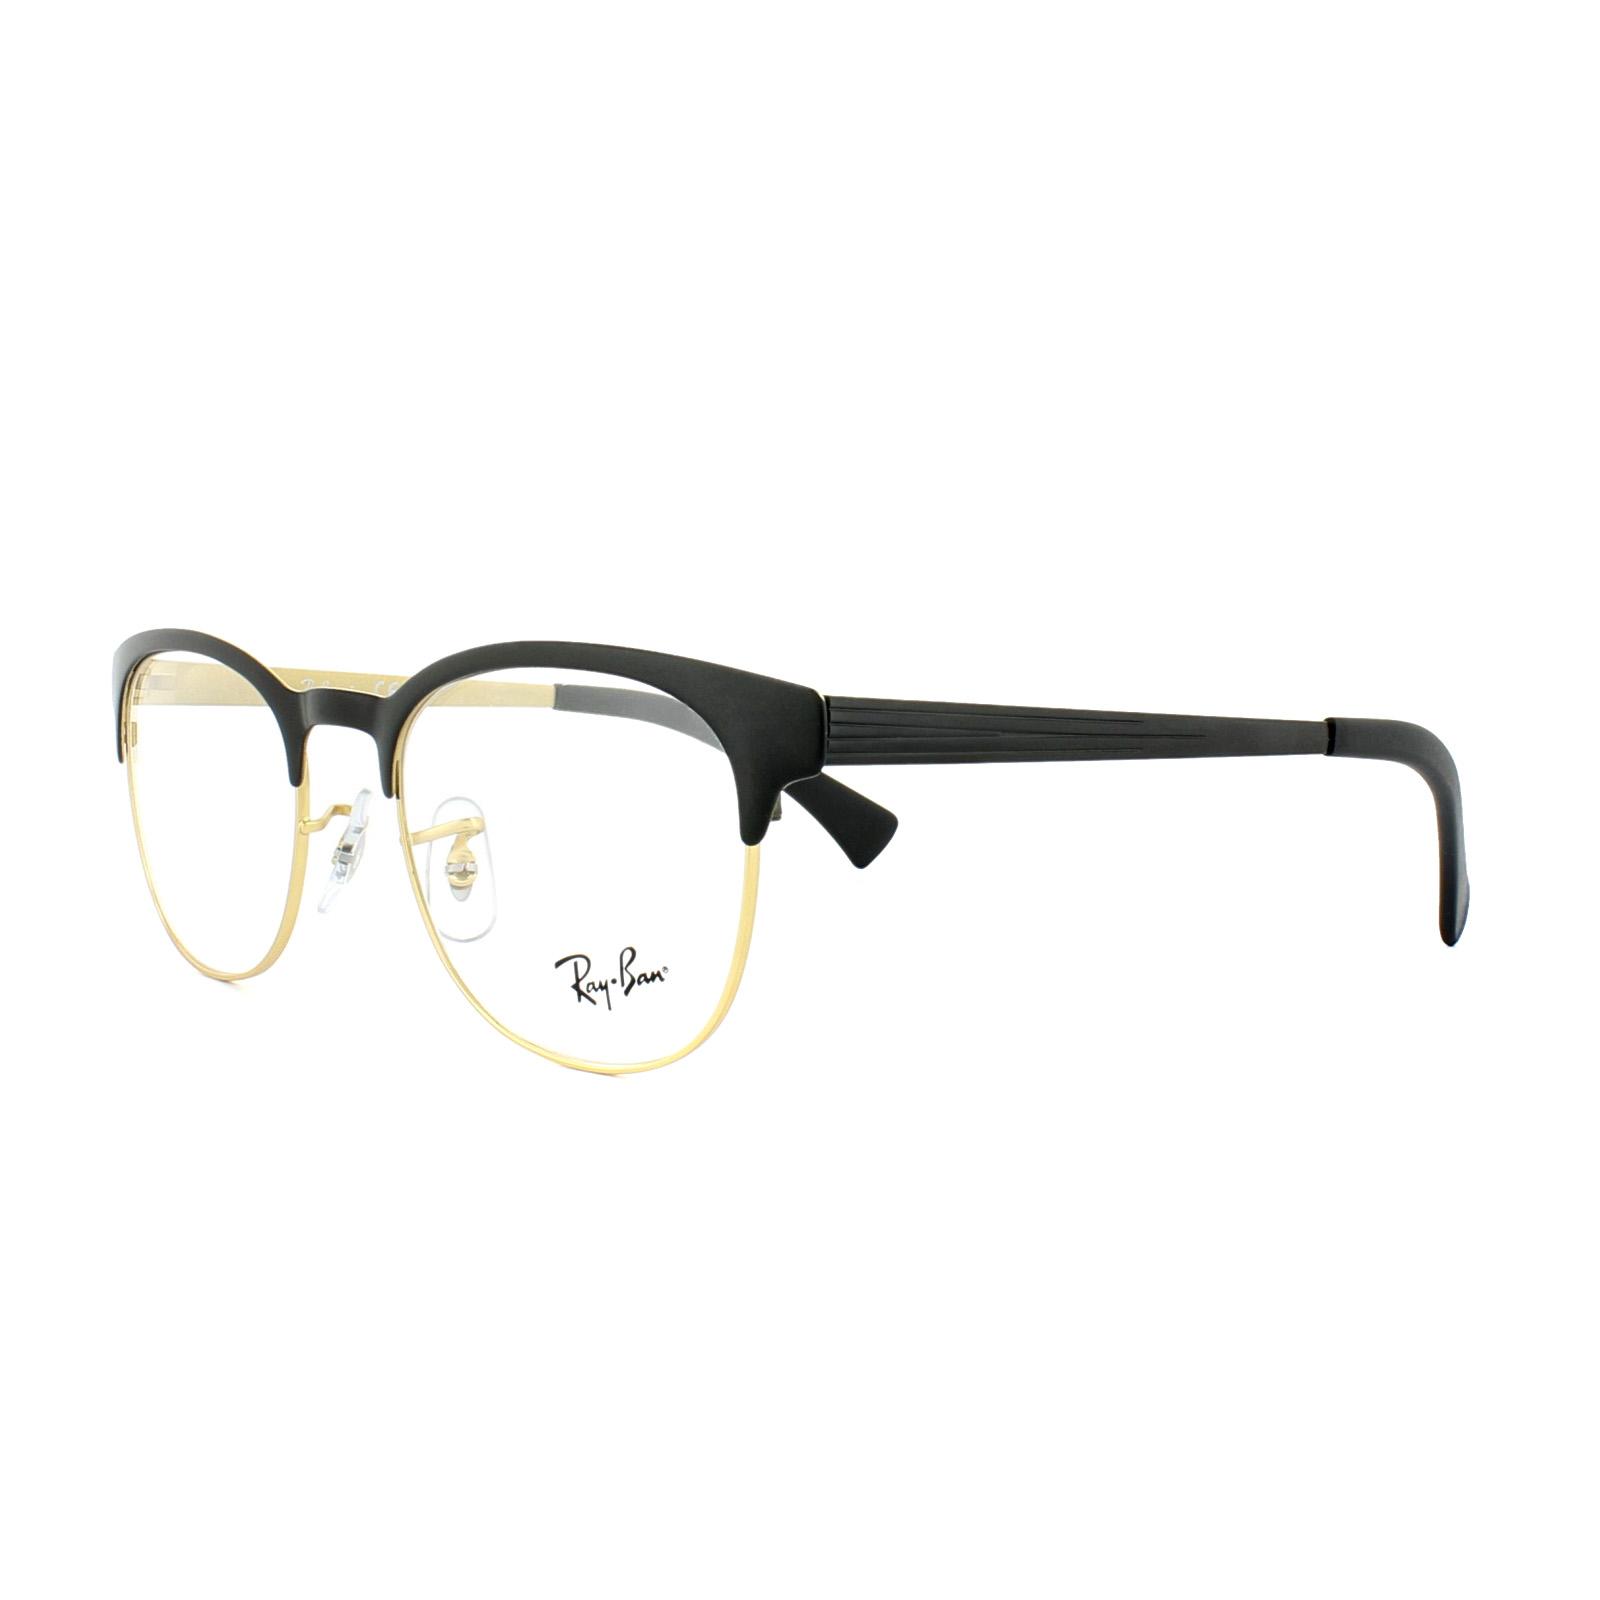 18c1287fd6 Sentinel Ray-Ban Glasses Frames 6317 2833 Top Black on Matte Gold Mens  Womens 51mm